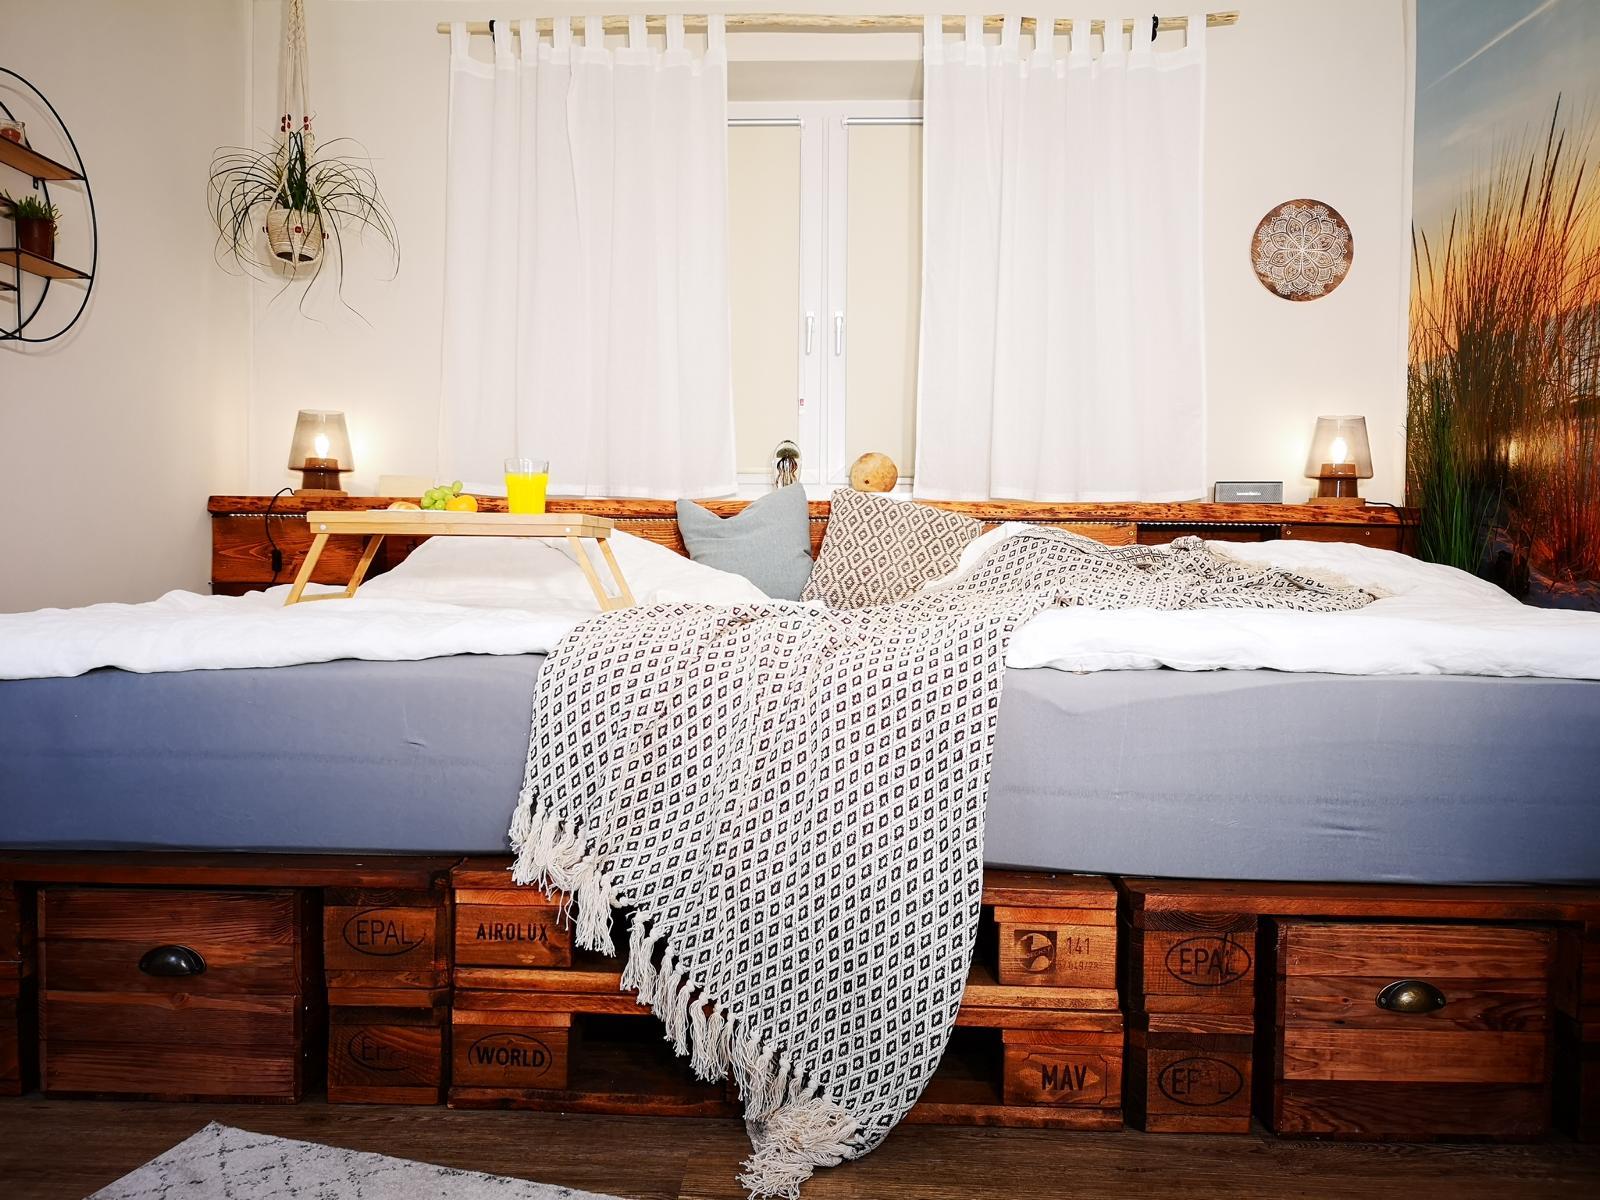 ᐅ Palettenbett selber bauen & kaufen | Europaletten Betten